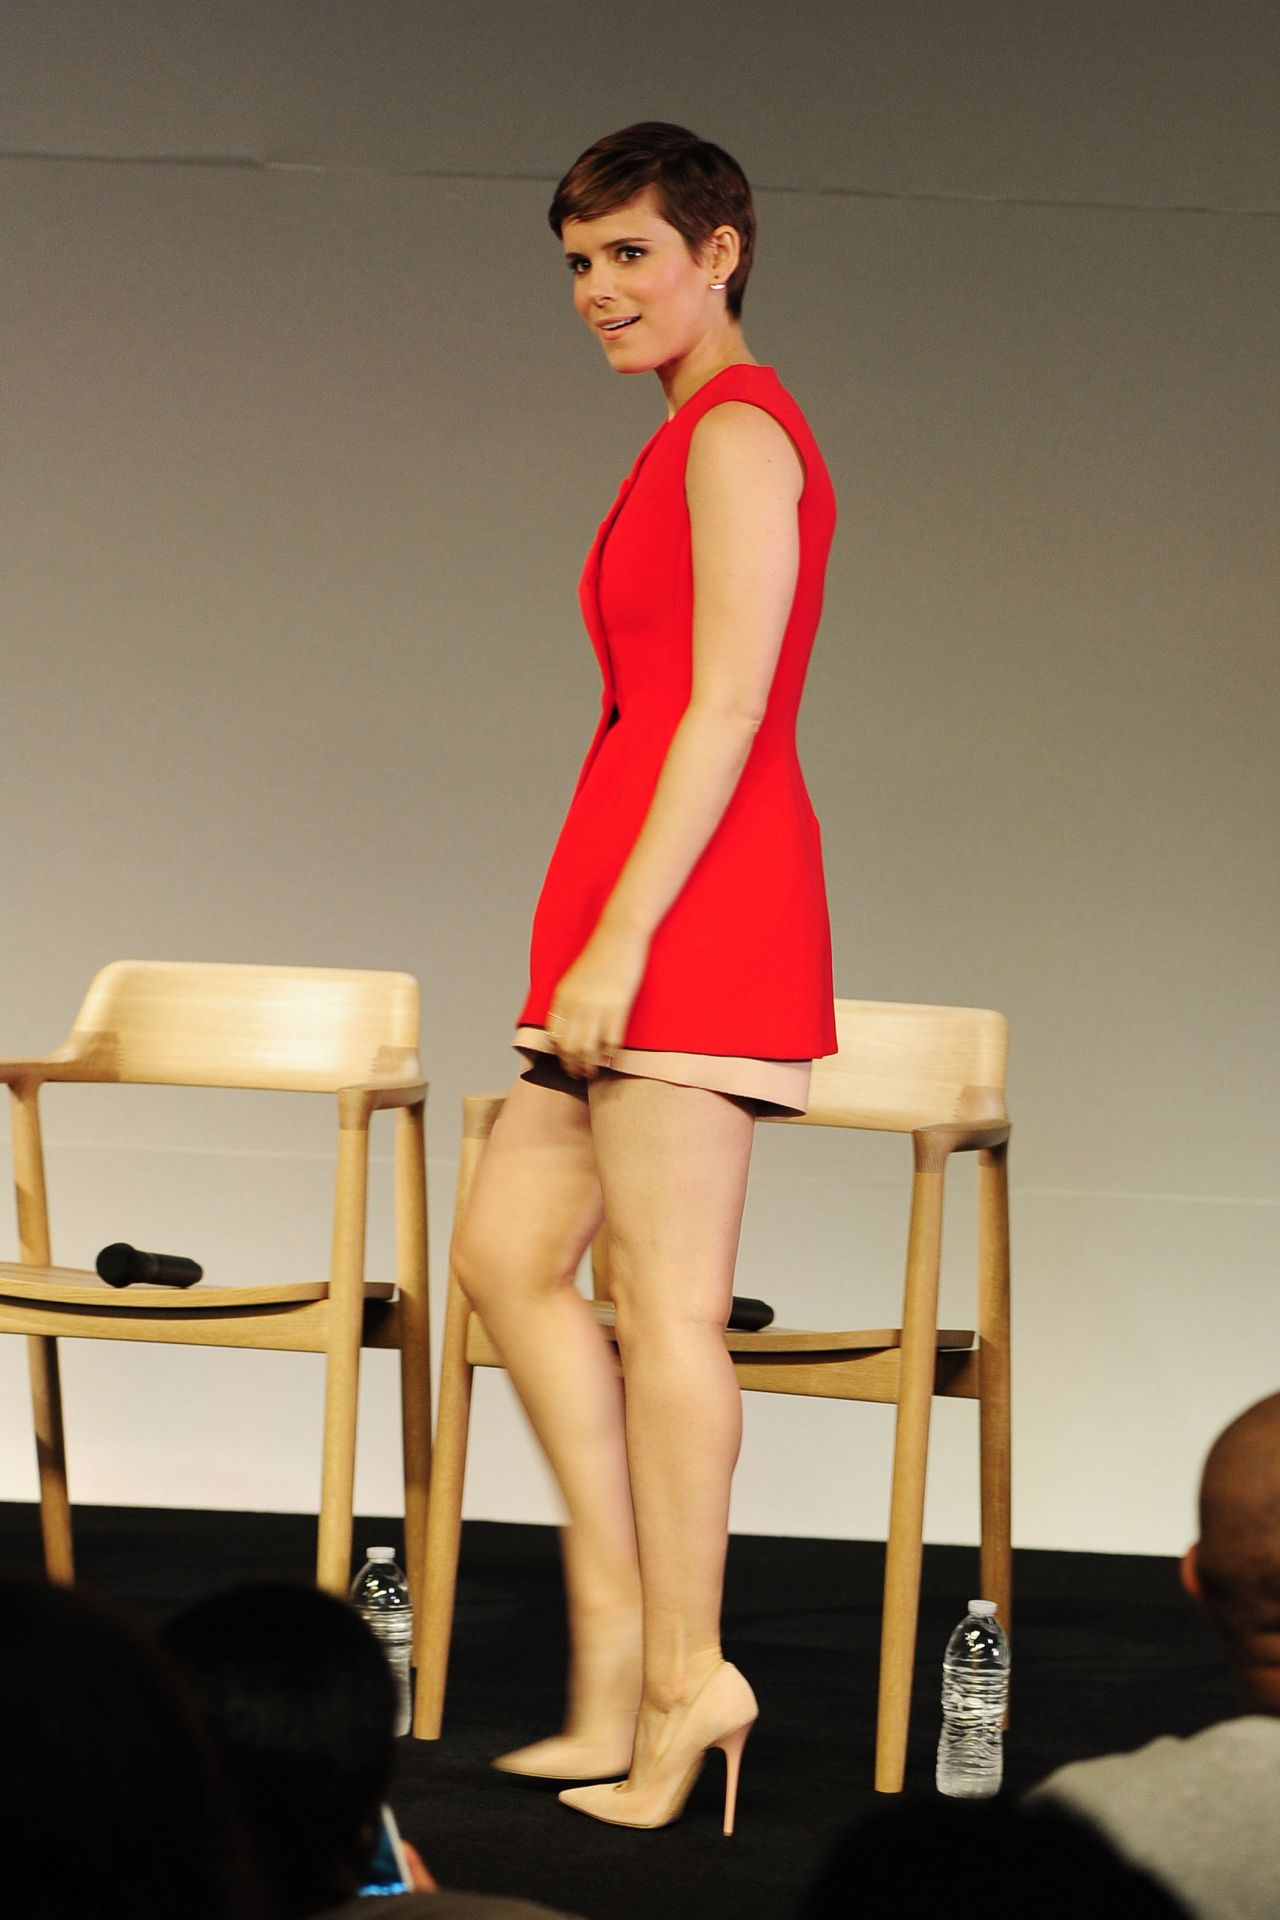 kate-mara-apple-store-meet-the-actors-fantastic-four-in-new-york-city_4